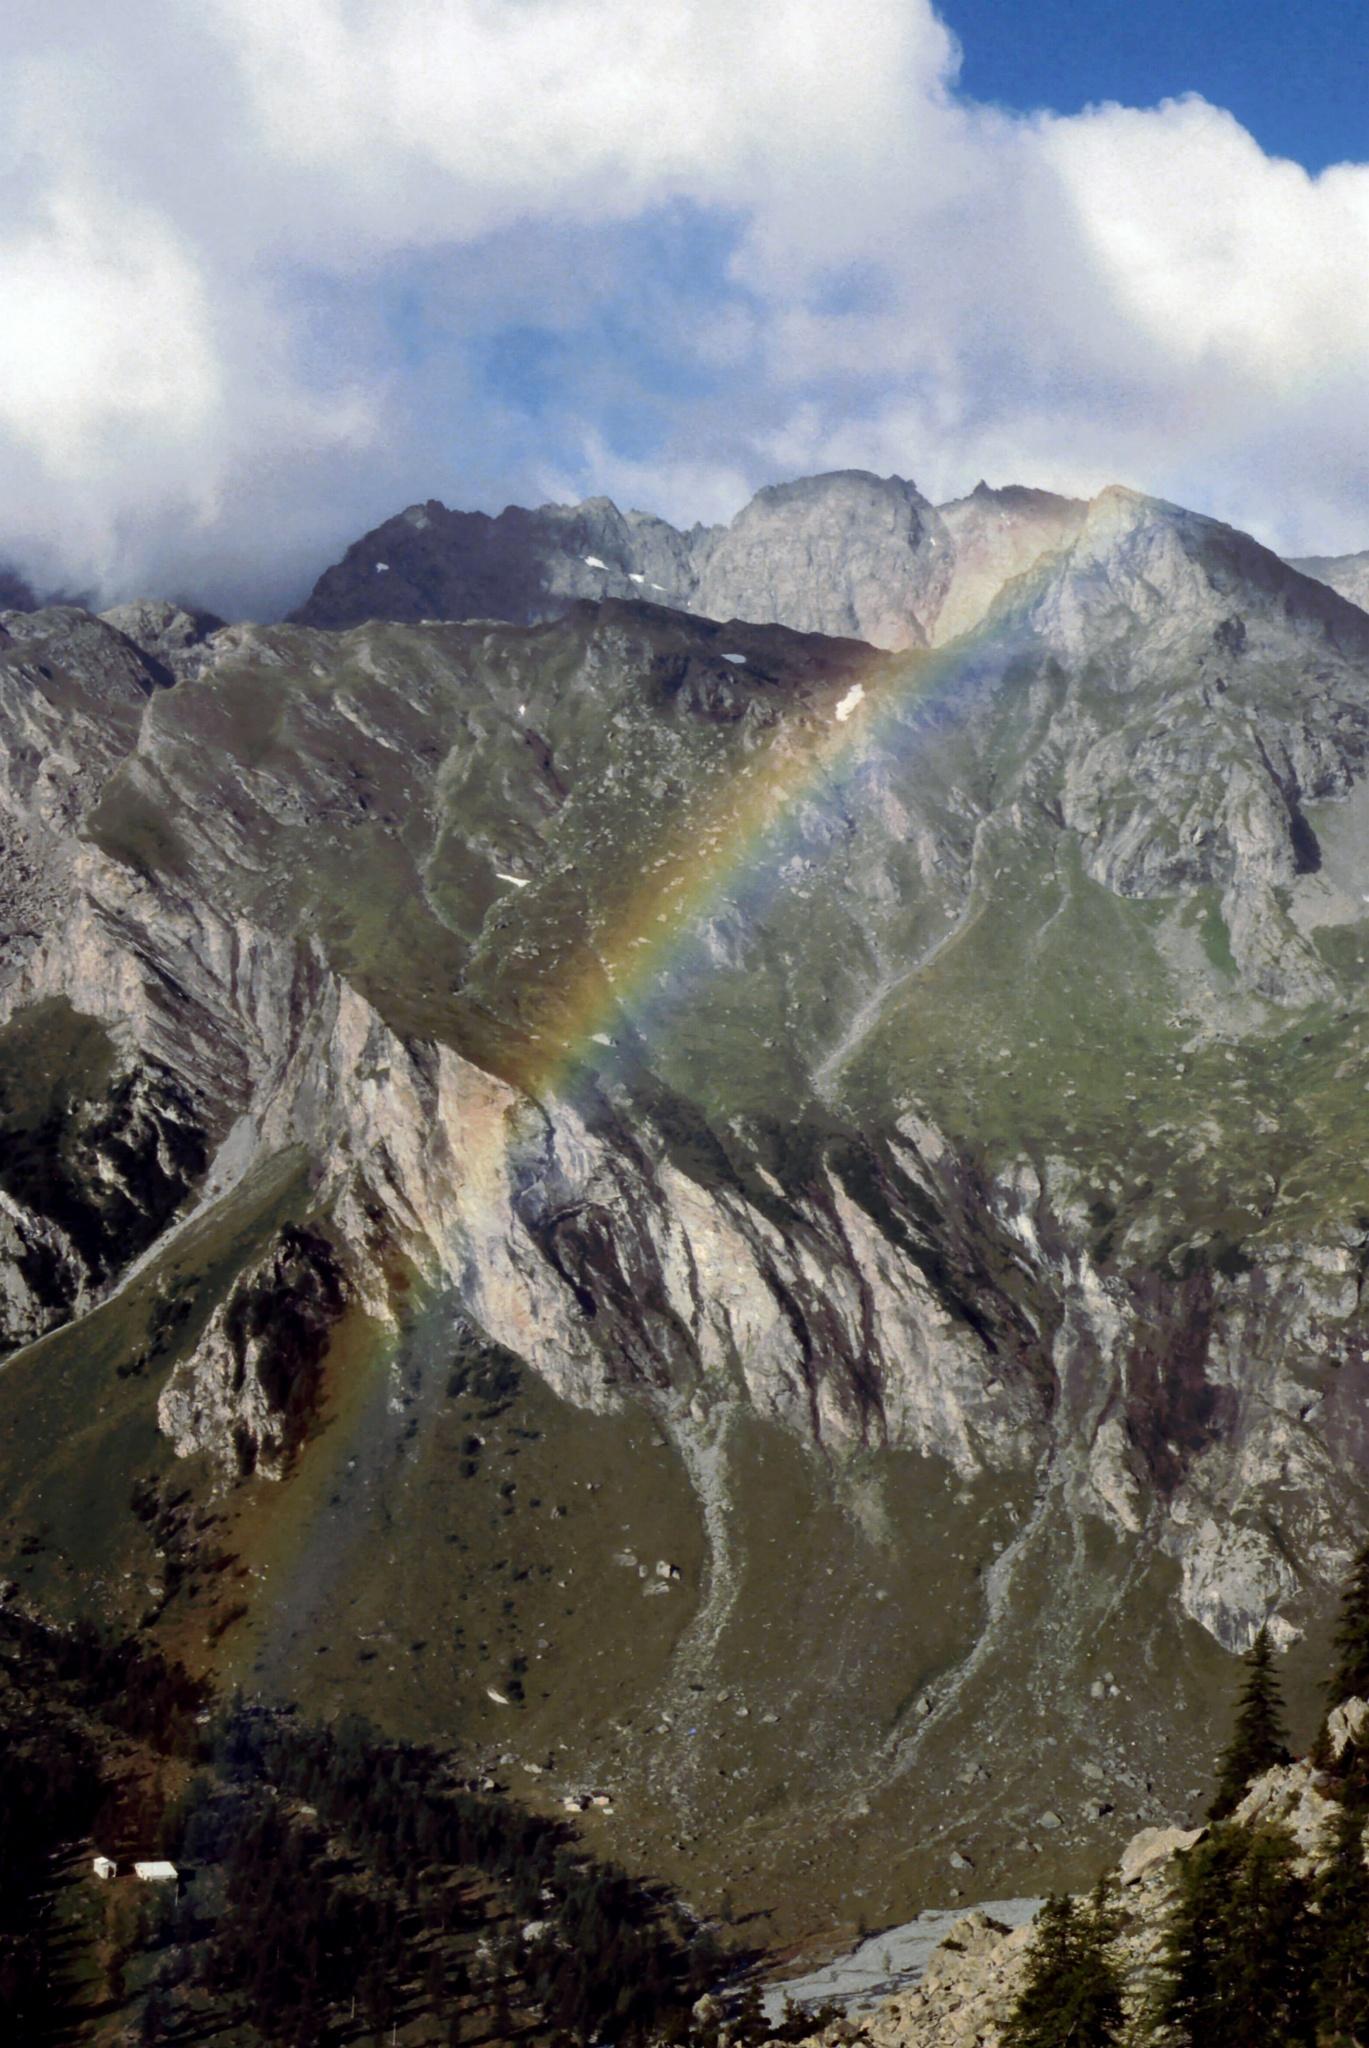 Rainbow in a curved air by Piercarlo Bedino